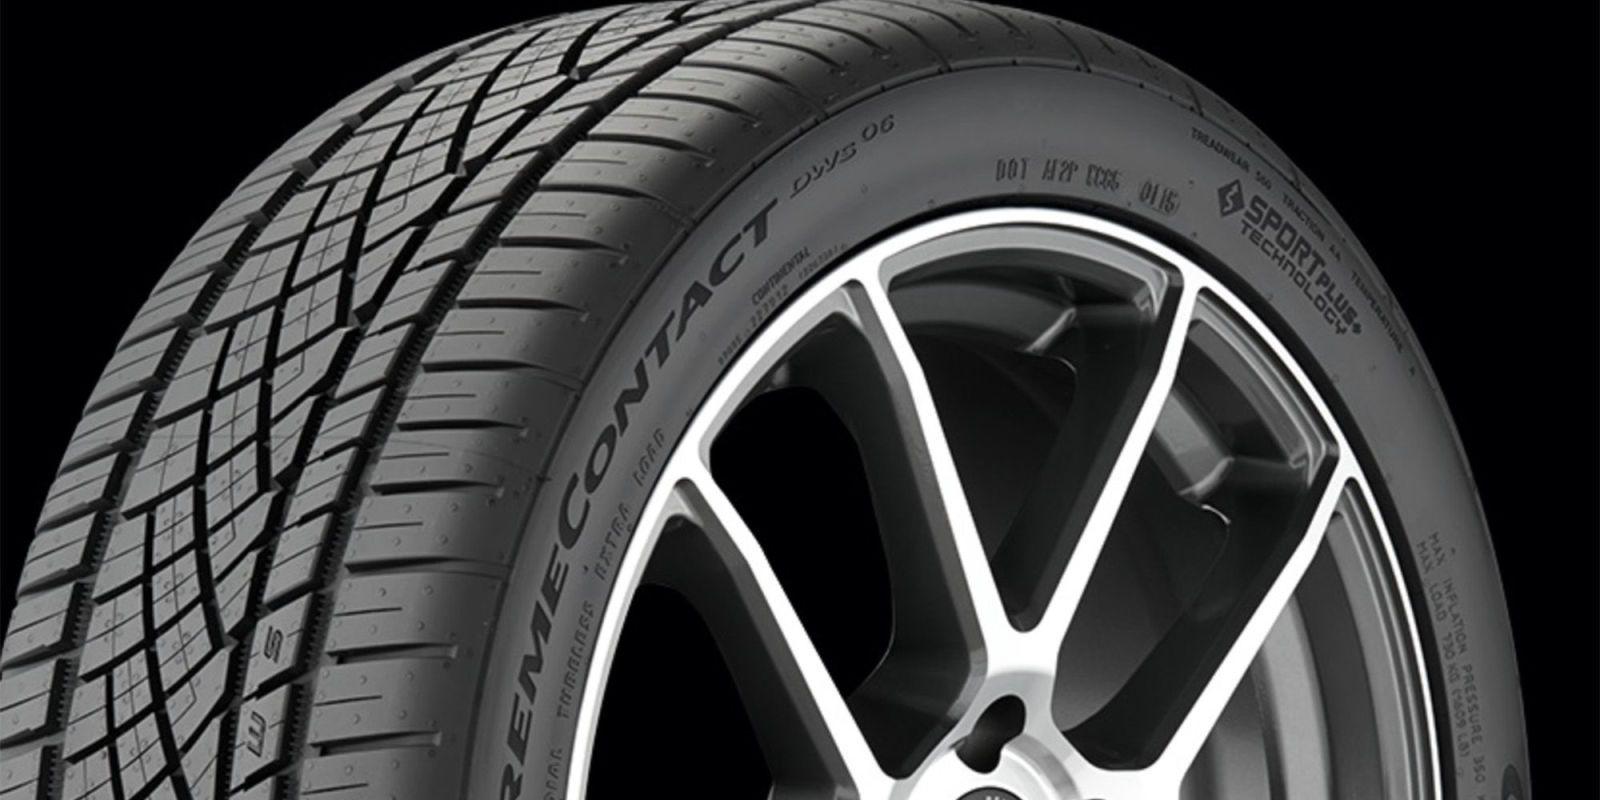 Tires with rim protection ridge